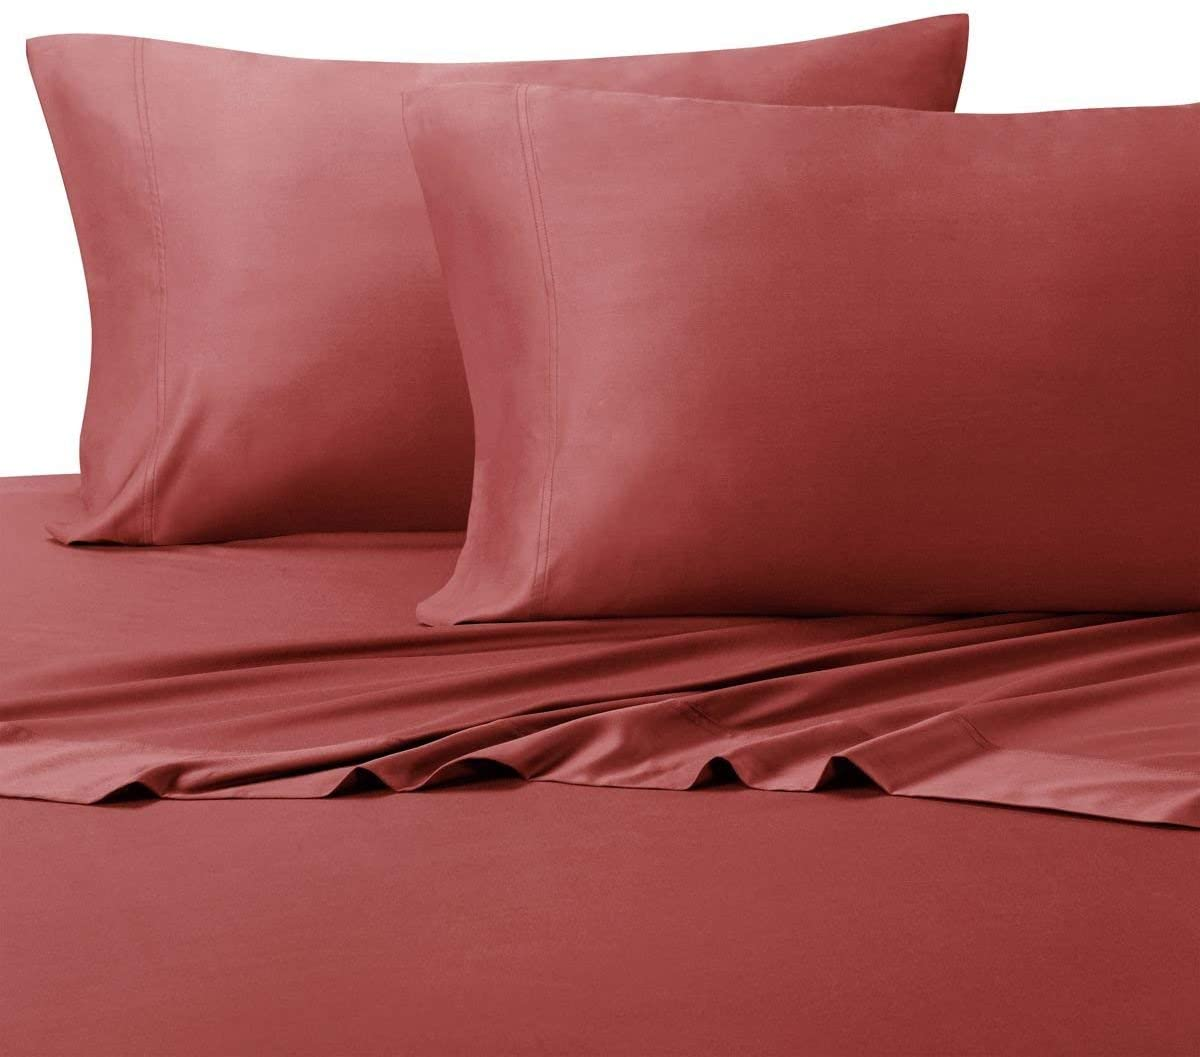 Royal Hotel Silky Soft Bamboo Cotton Sheet Set, 100% Bamboo-Cotton Bed Sheets, King Size, Coral